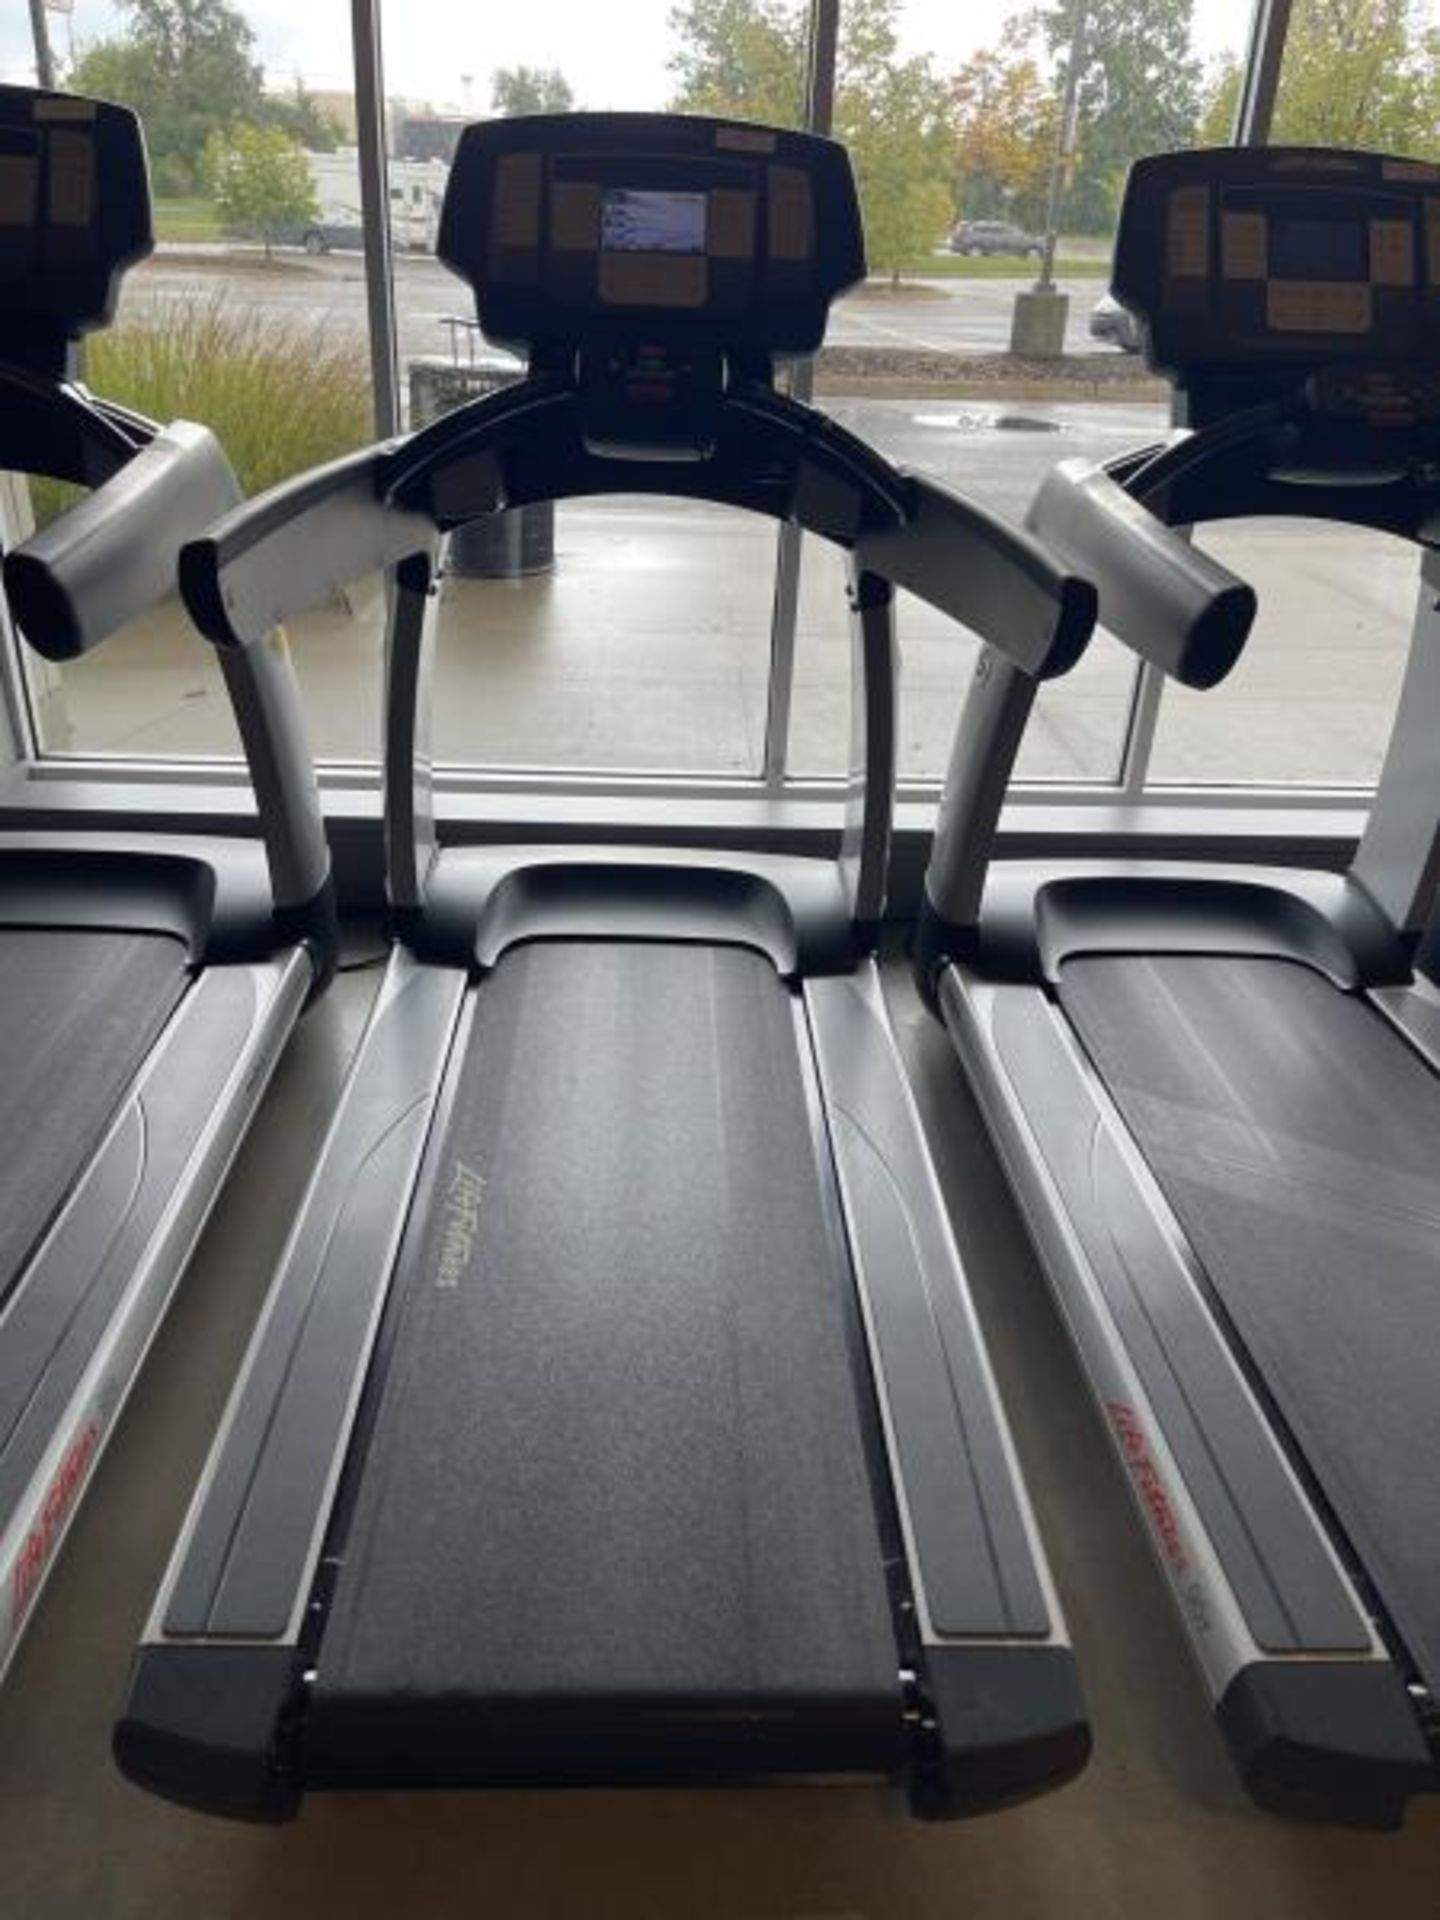 Life Fitness Treadmill M: 95T with Flex Deck, Shock Absorption System SN: TET107109